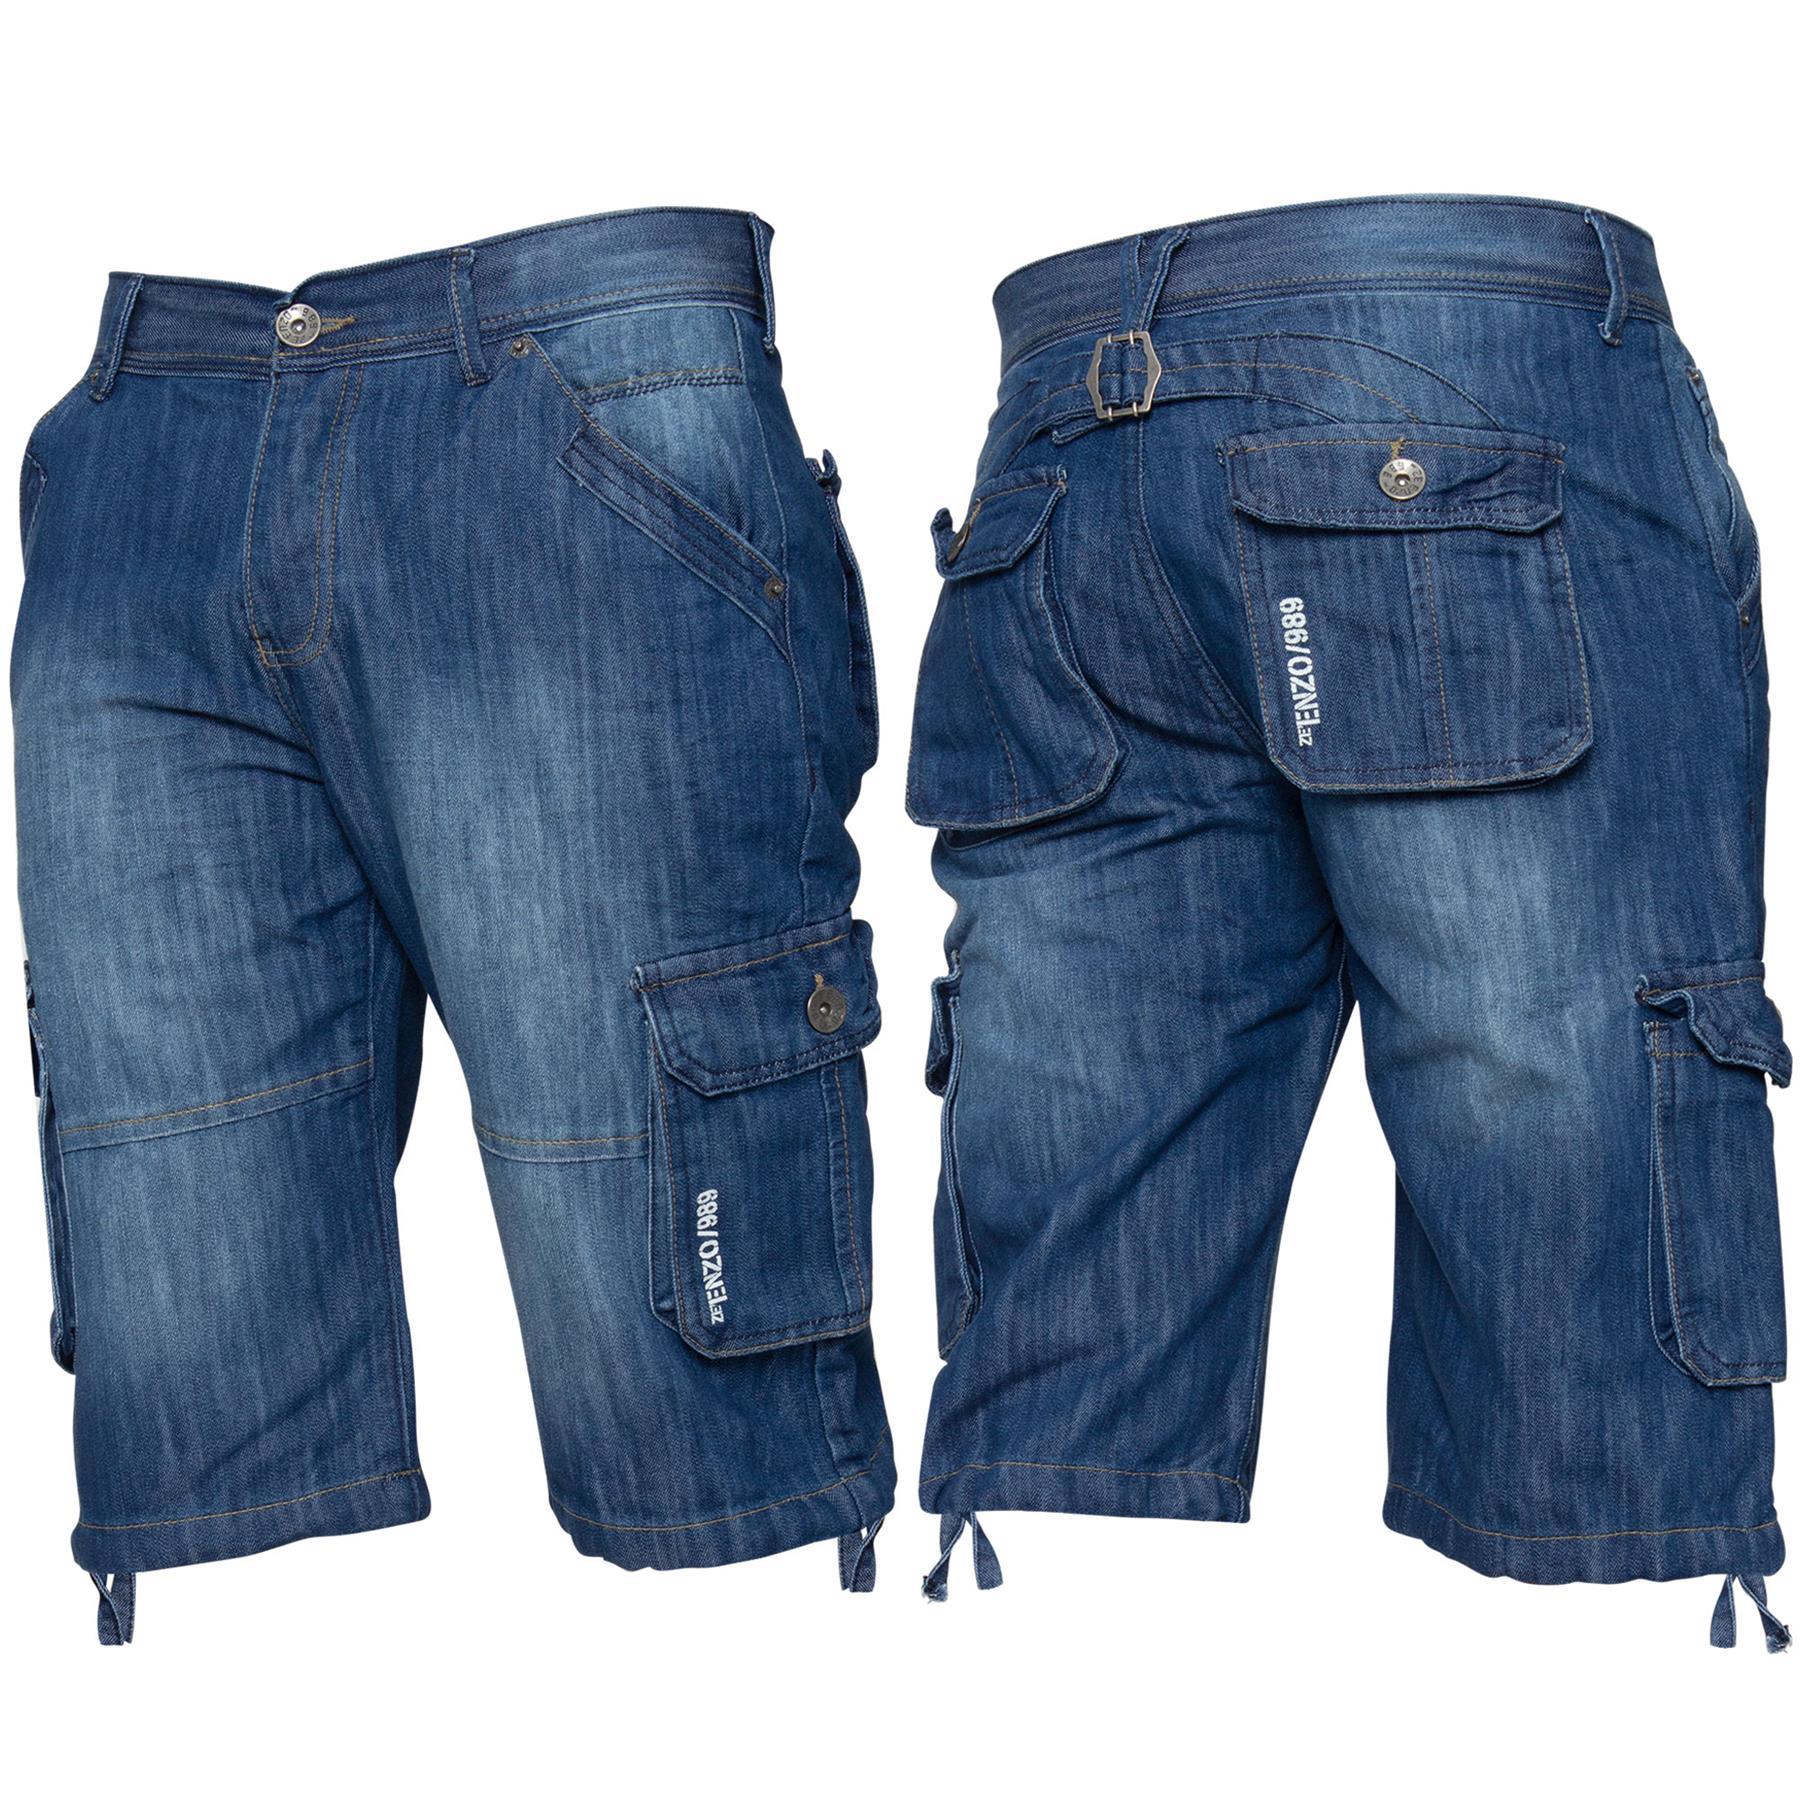 ENZO-Jeans-para-hombre-de-carga-combate-informal-de-verano-Shorts-Pantalones-Cortos-de-Jeans-Todas miniatura 7